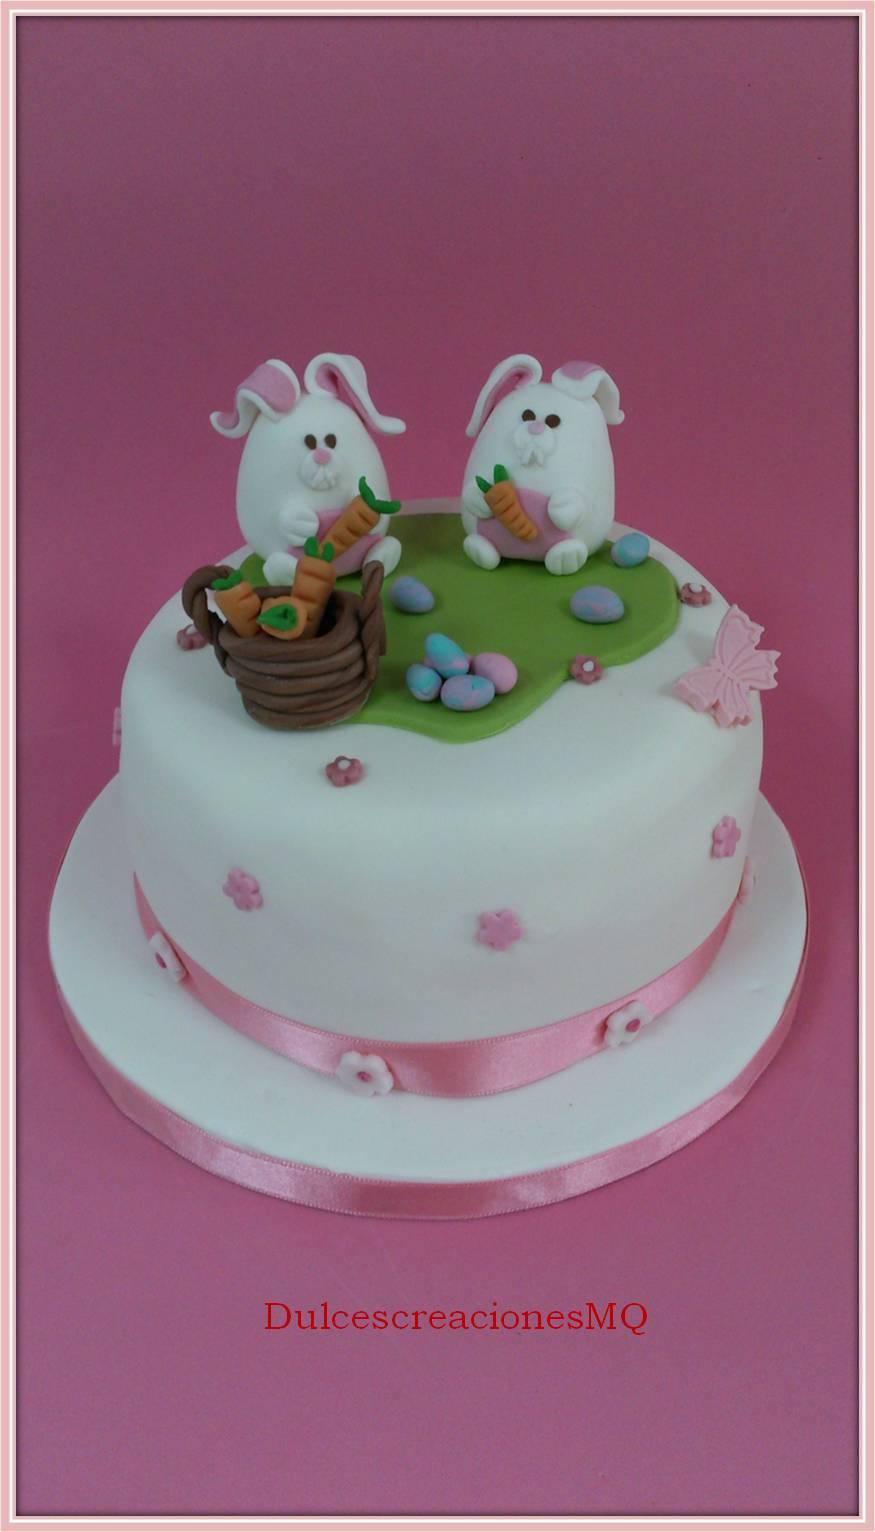 Tarta Mona Pascua Conejitos Conejos Bizcocho Vainilla Victoria Sponge Cake Dulce Fondant Buttercream Fresa Dulce de Leche Niña Cumpleaños Aniversario Huevos Zanahorias Flores Mariposas Primavera Esponjoso